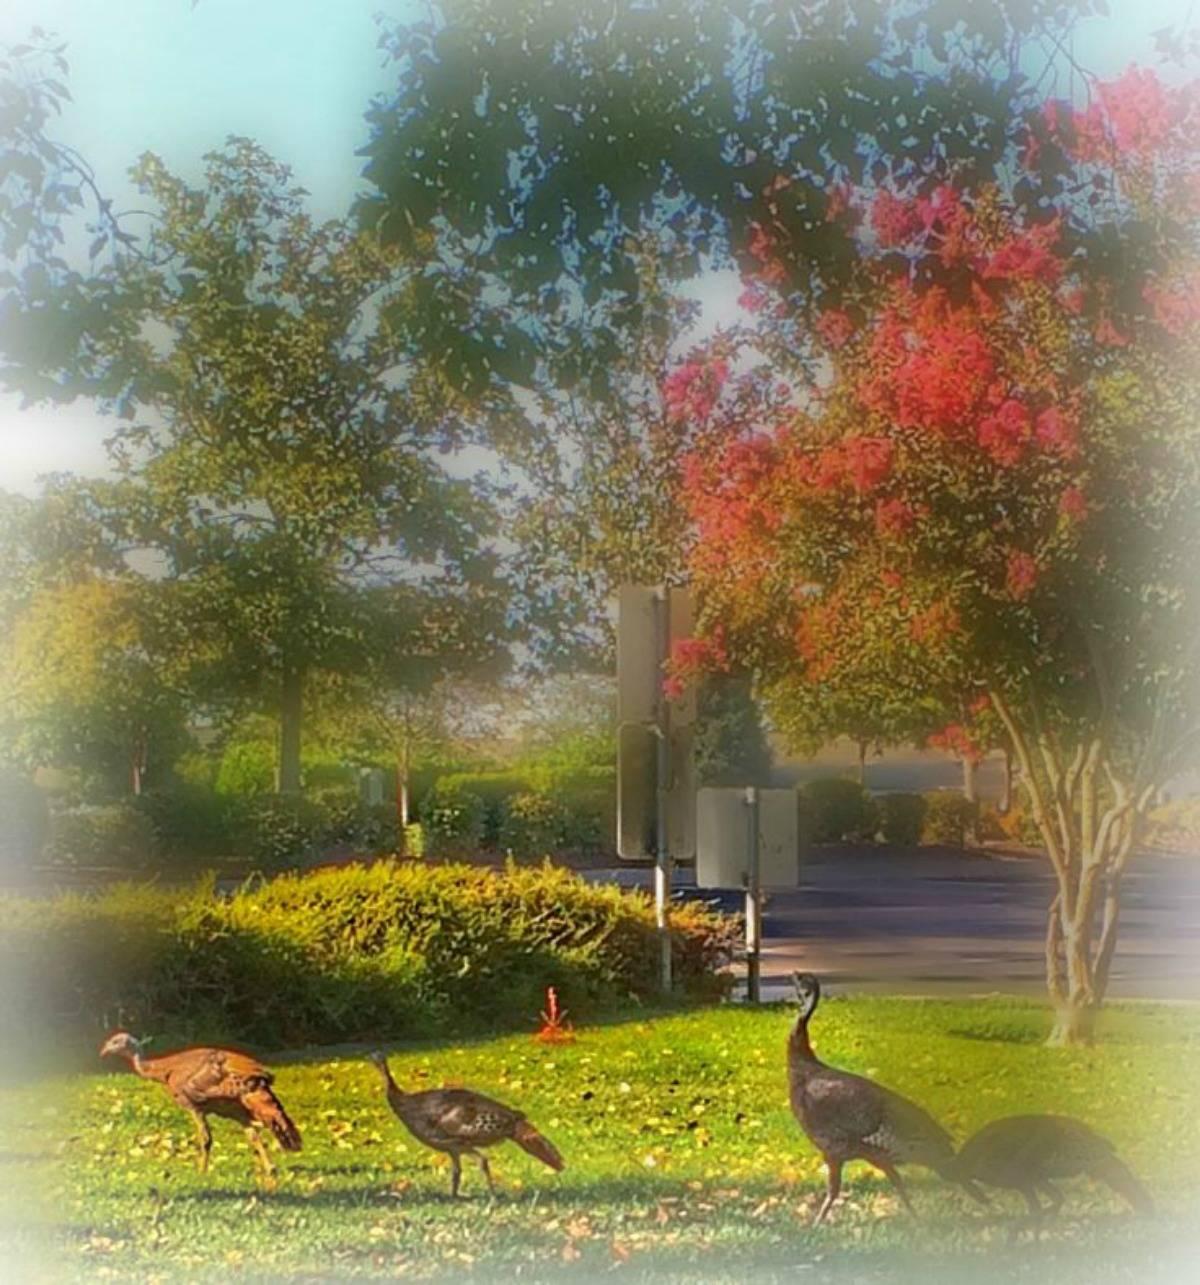 Wild Turkeys wander around West Roseville including one of the best golf retirement communities Sun City by Del Webb via Kaye Swain